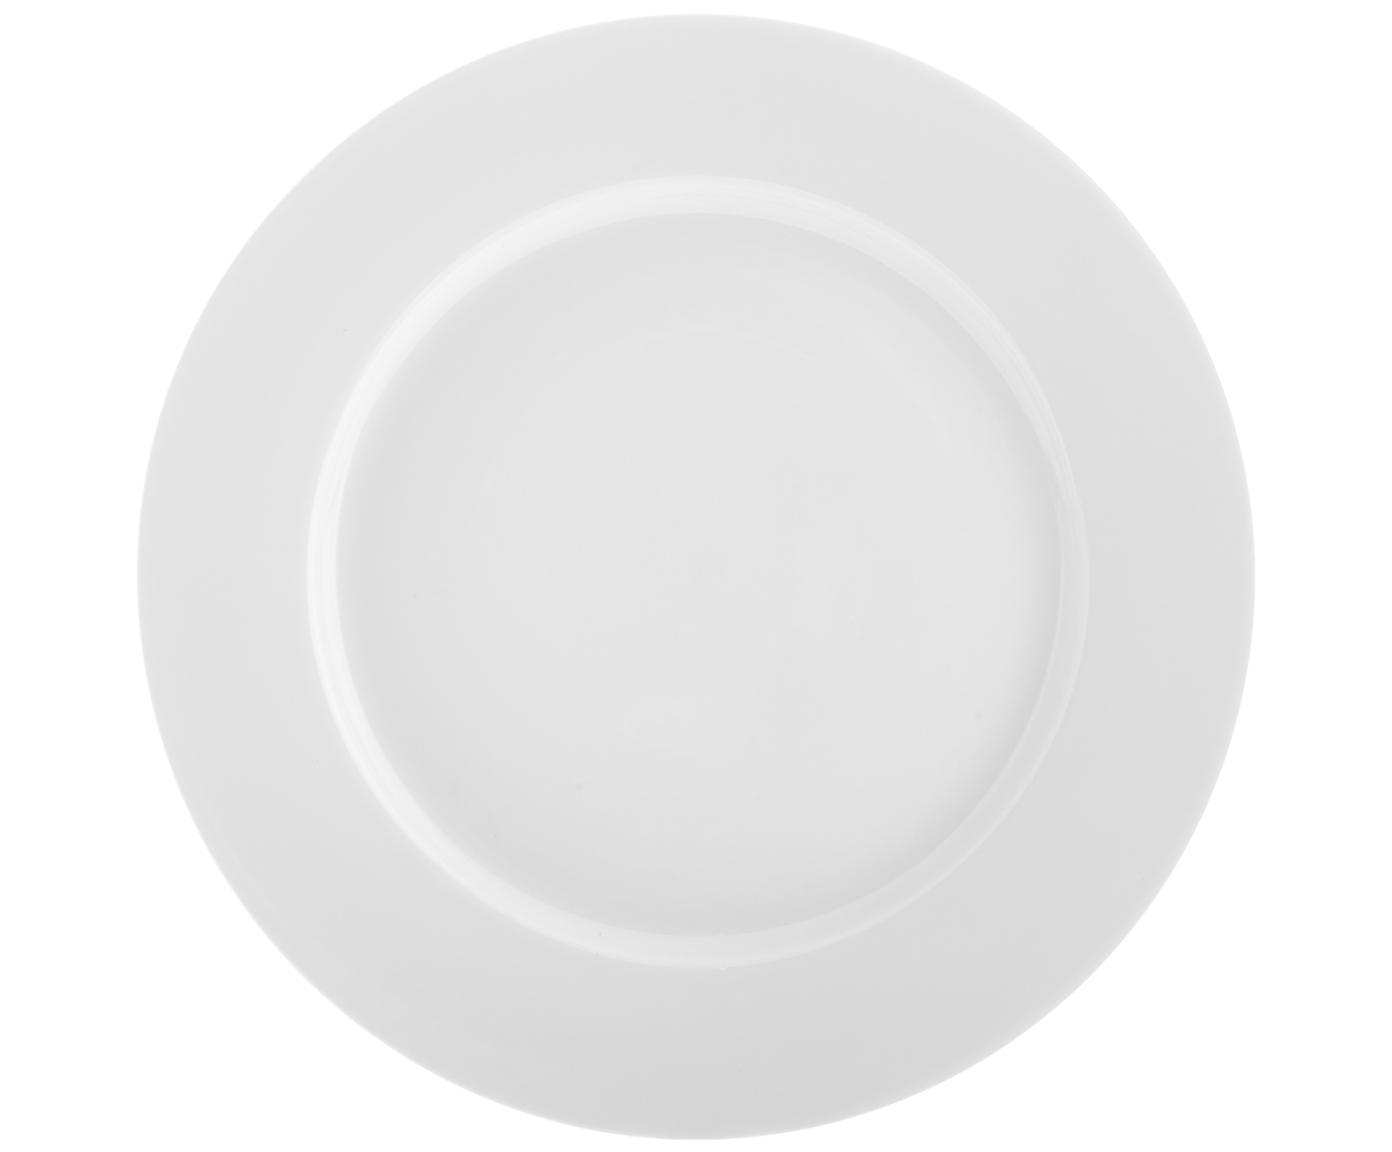 Platos de postre Delight Classic, 2uds., Porcelana, Blanco, Ø 23 cm